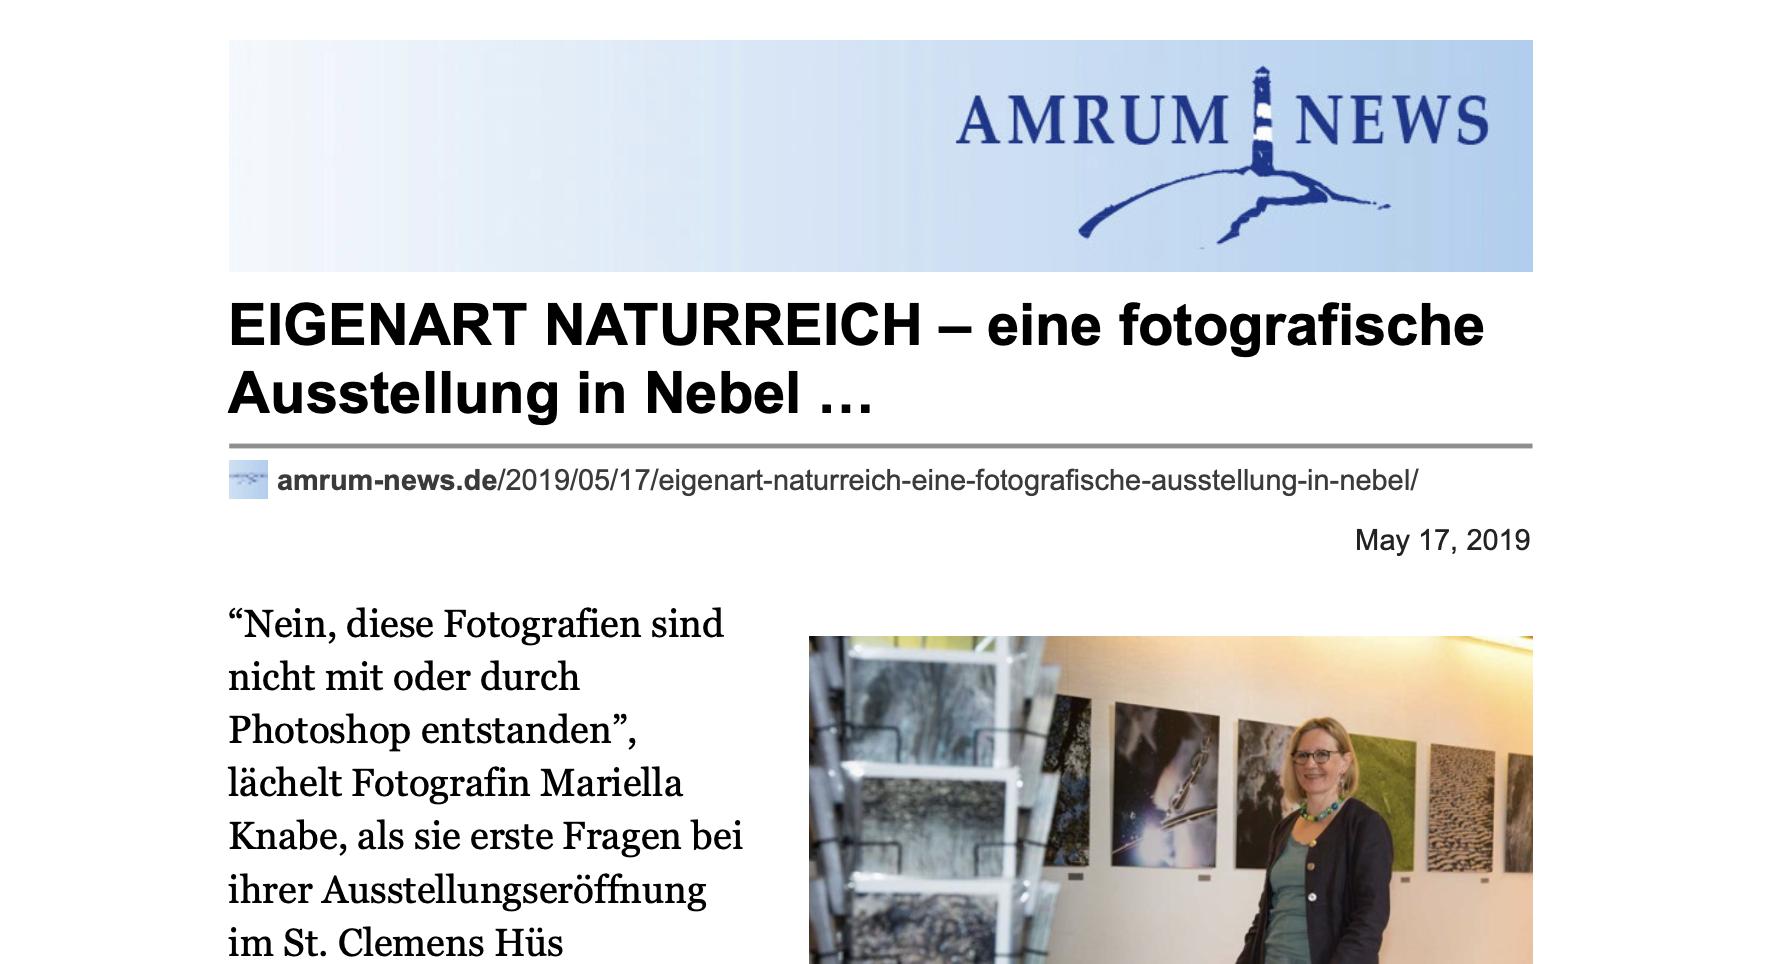 Mariella Knabe, Eigenart-Naturreich, Presseartikel Amrum-News